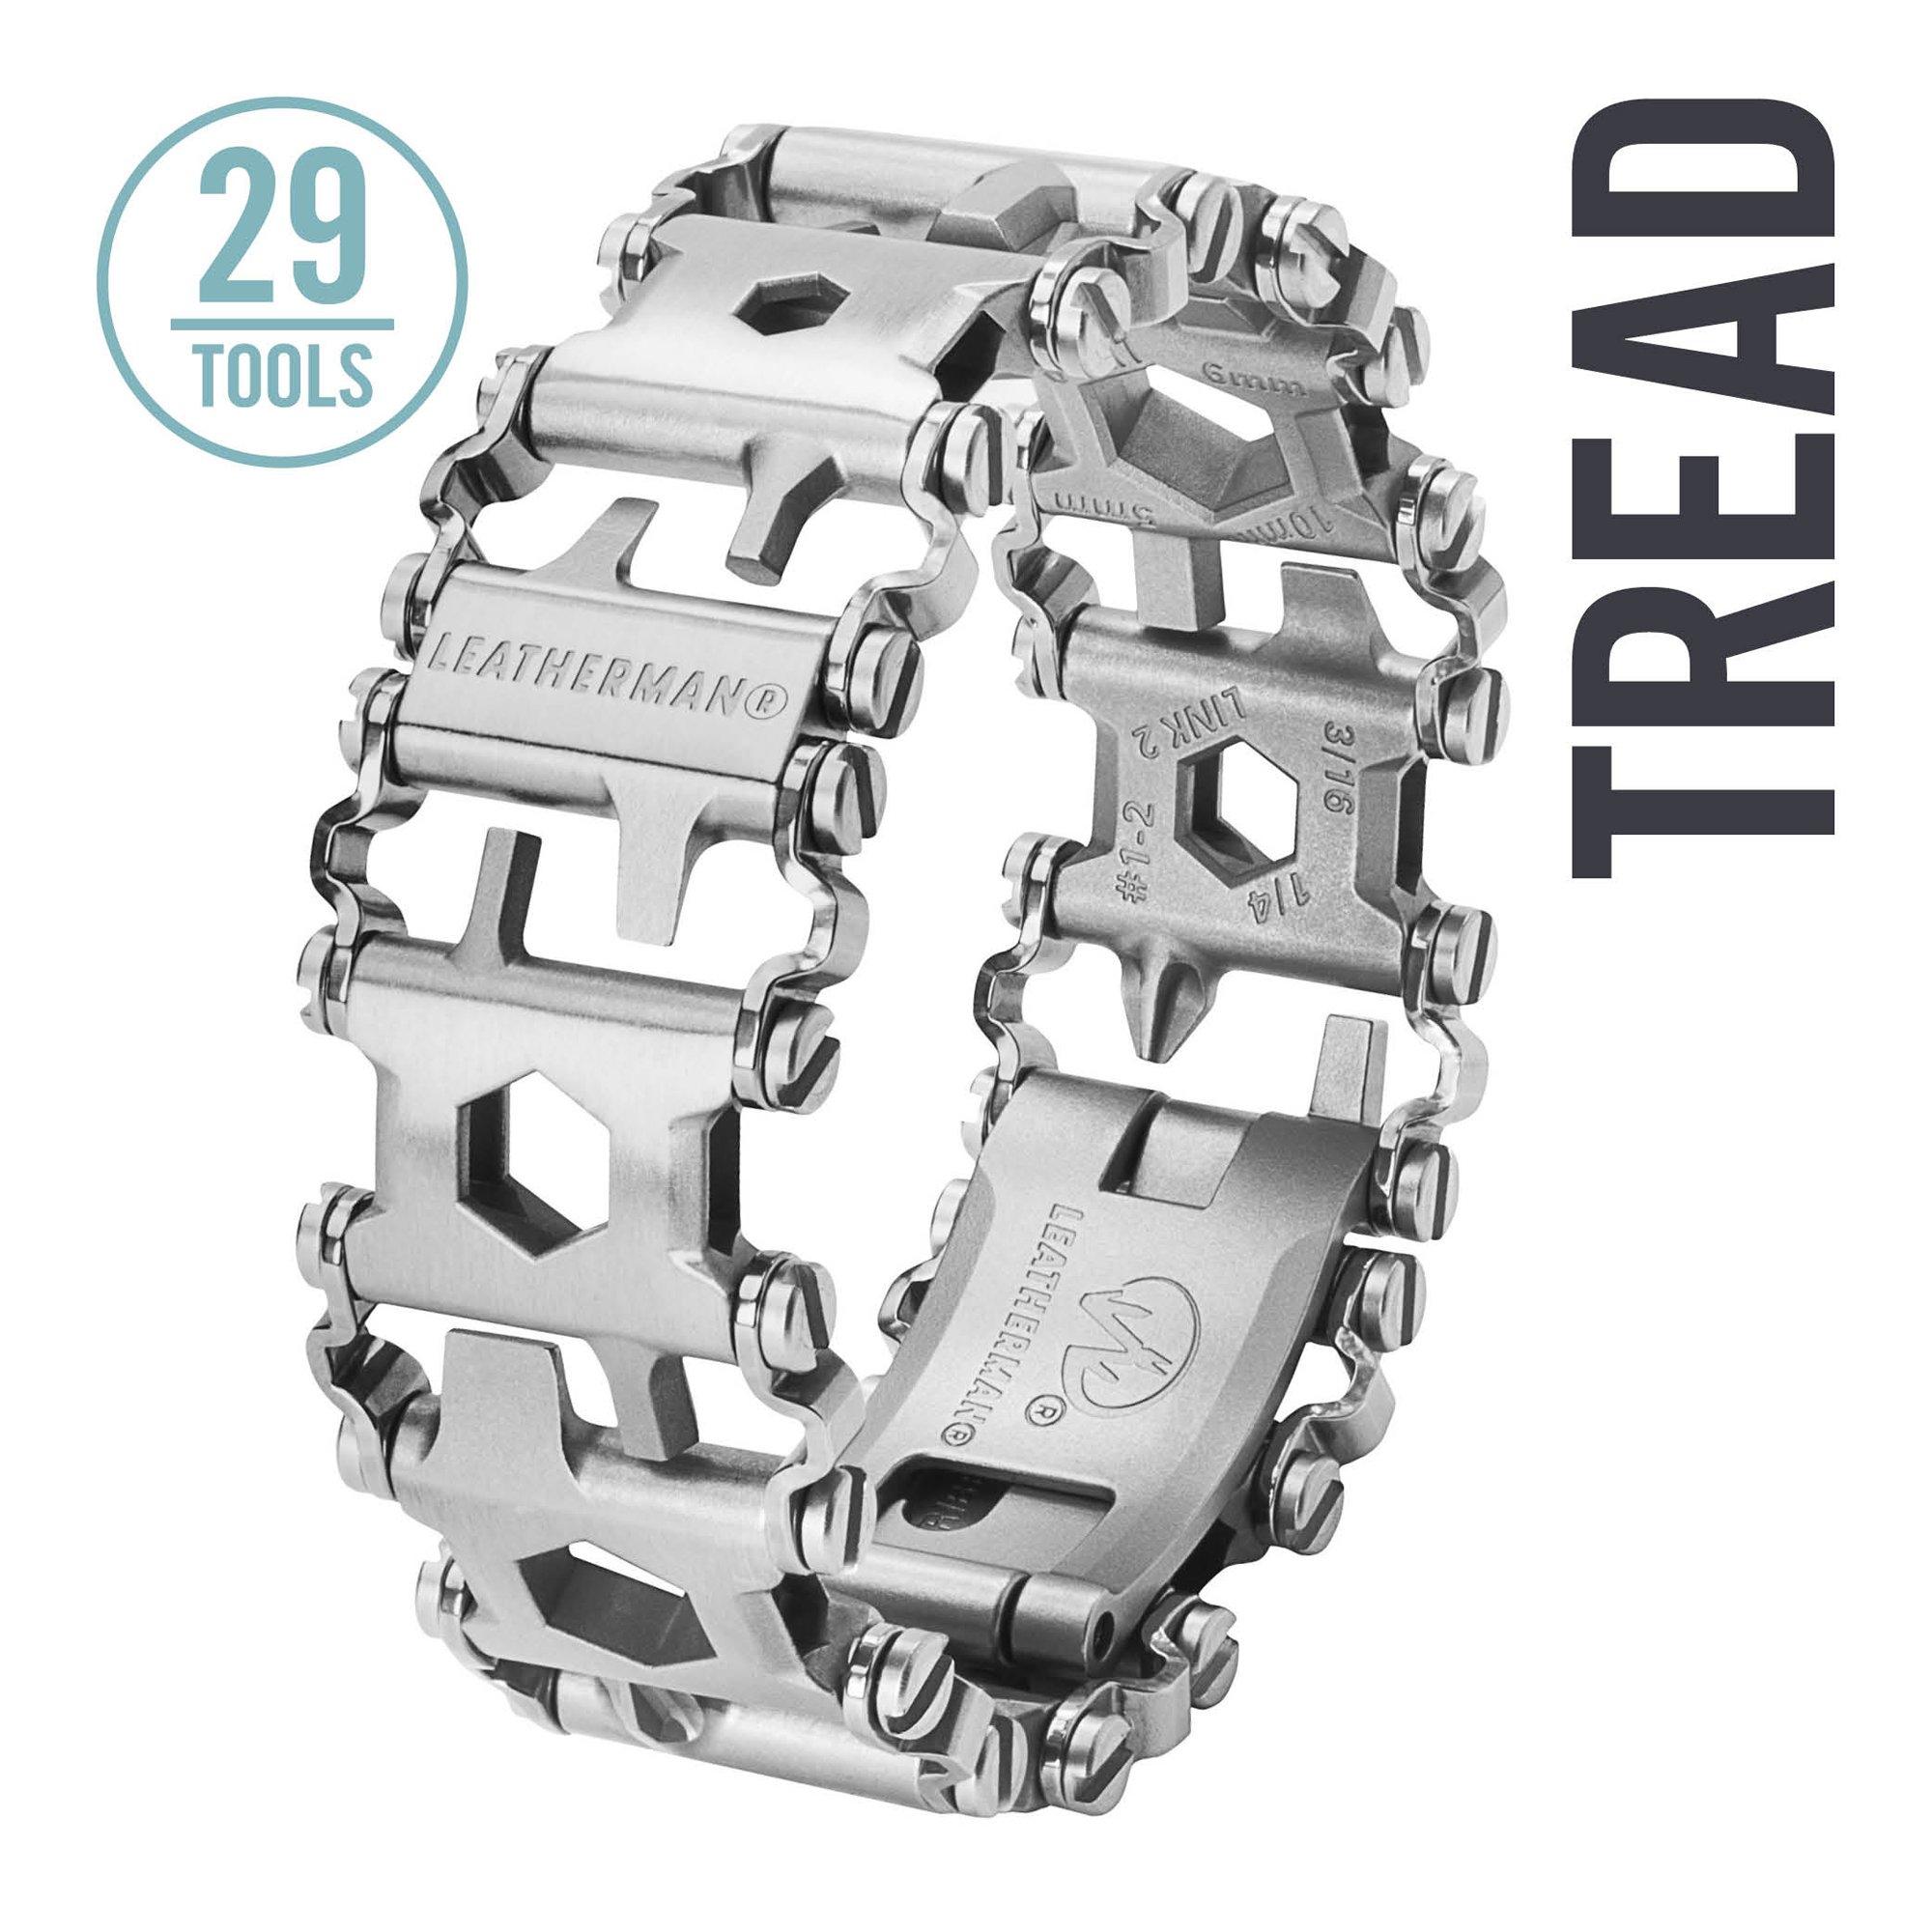 Leatherman - Tread Bracelet, The Original Travel Friendly Wearable Multitool, Stainless Steel (FFP)